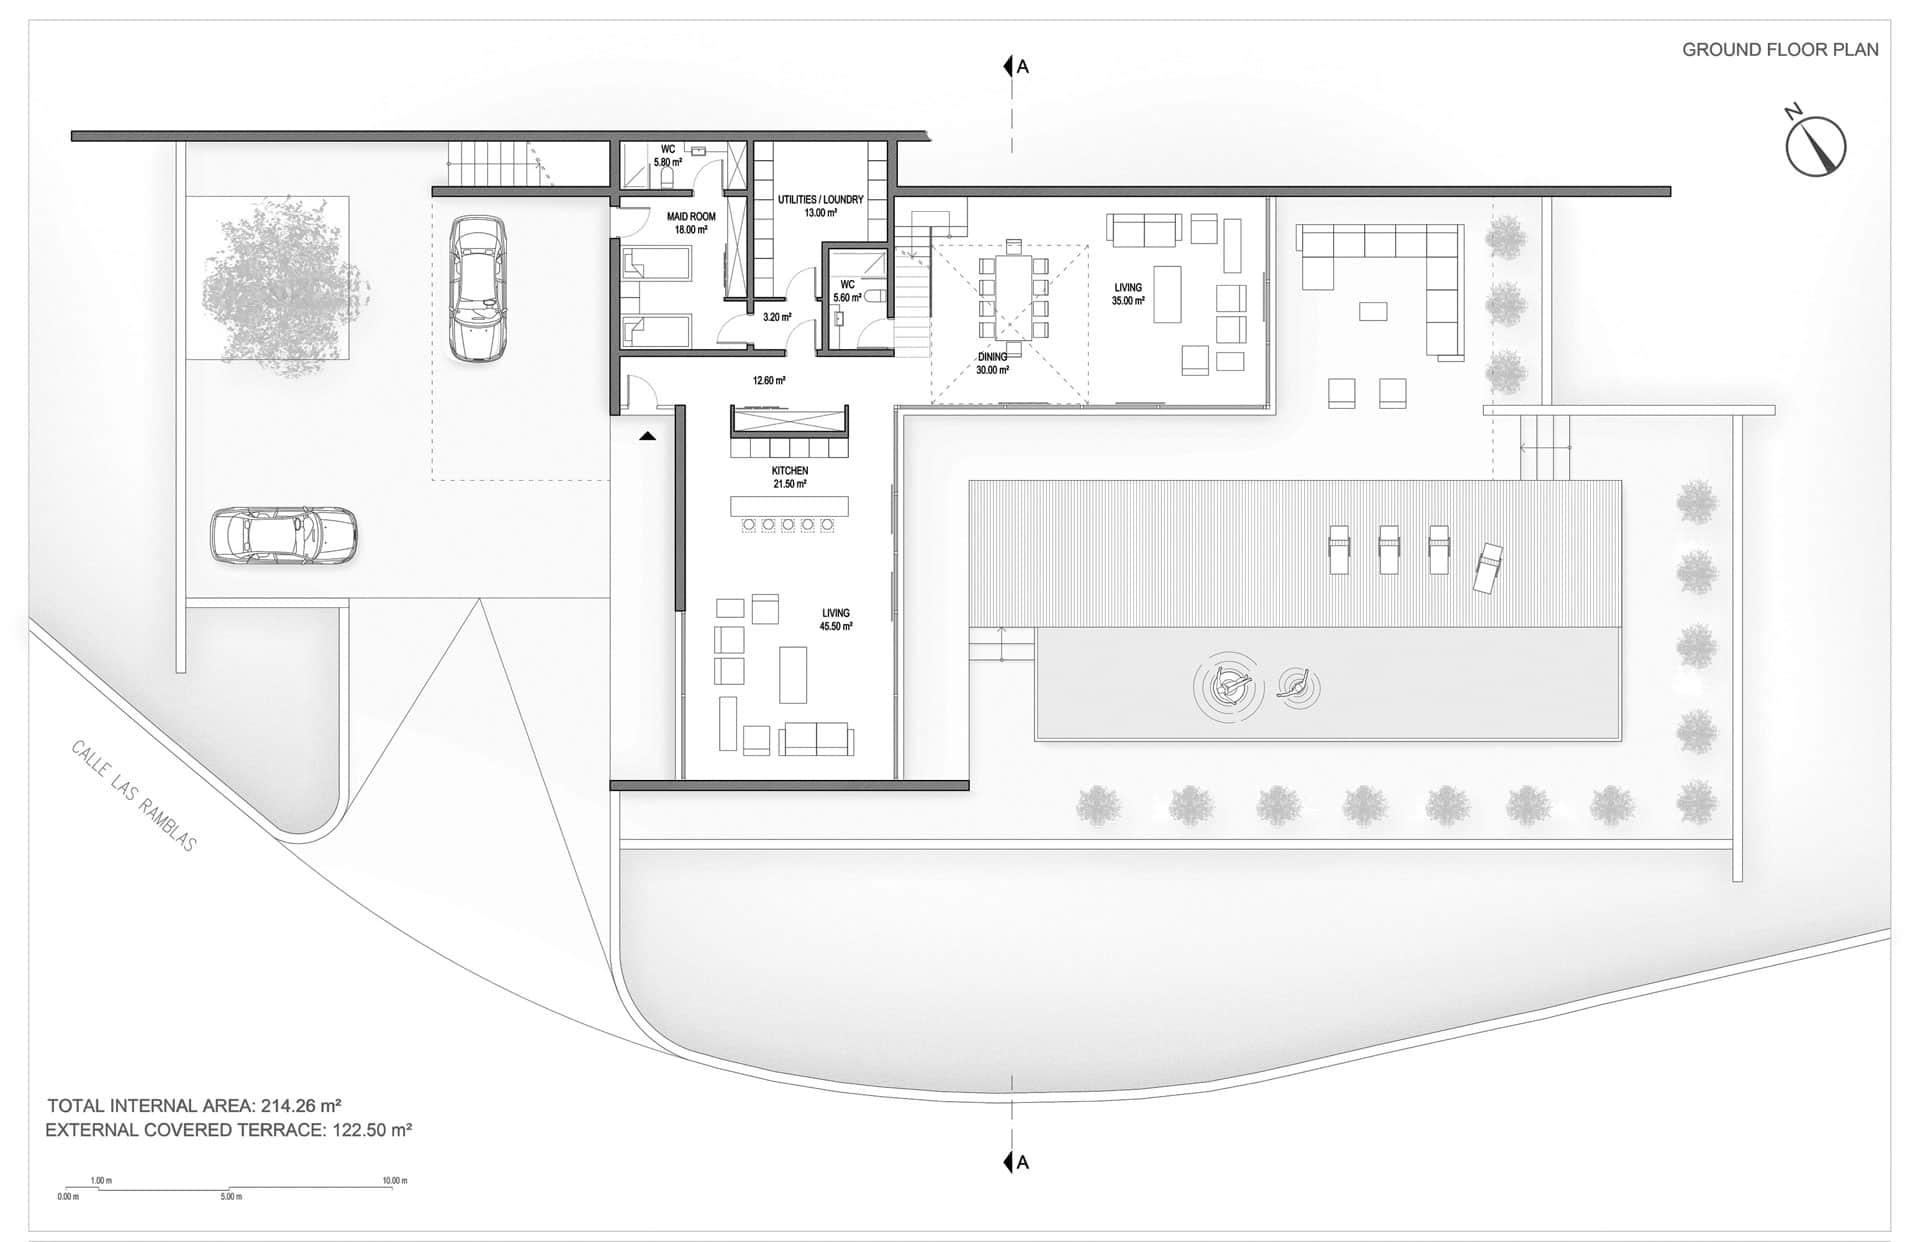 Modern Unexpected Concrete Flat Roof House Plans. Villa Altea first floor